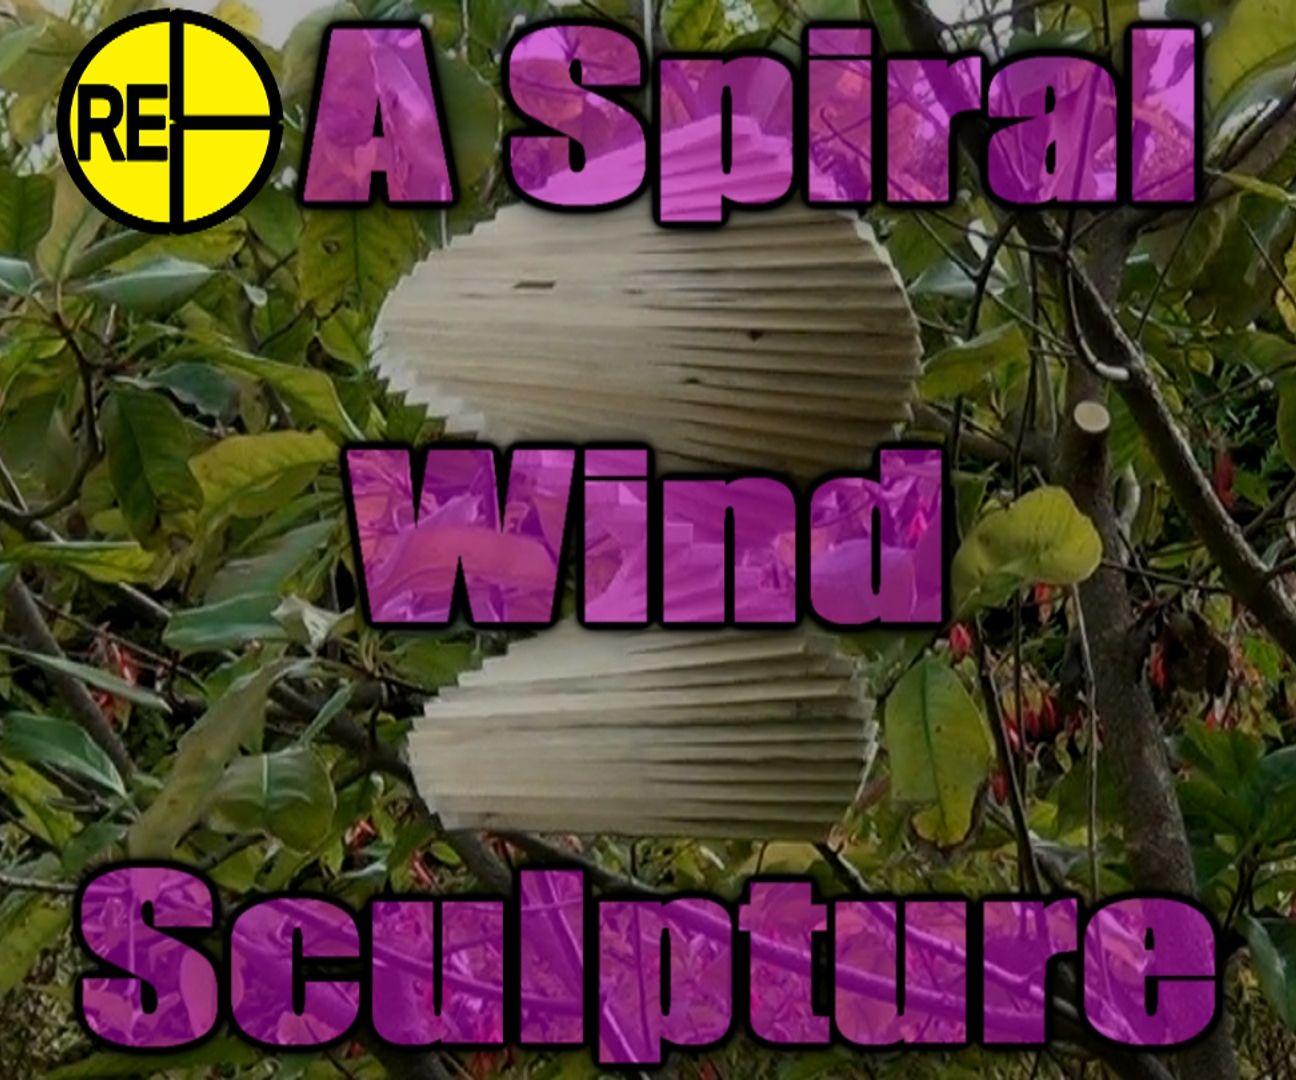 How to Make a Spiral Wind Sculpture